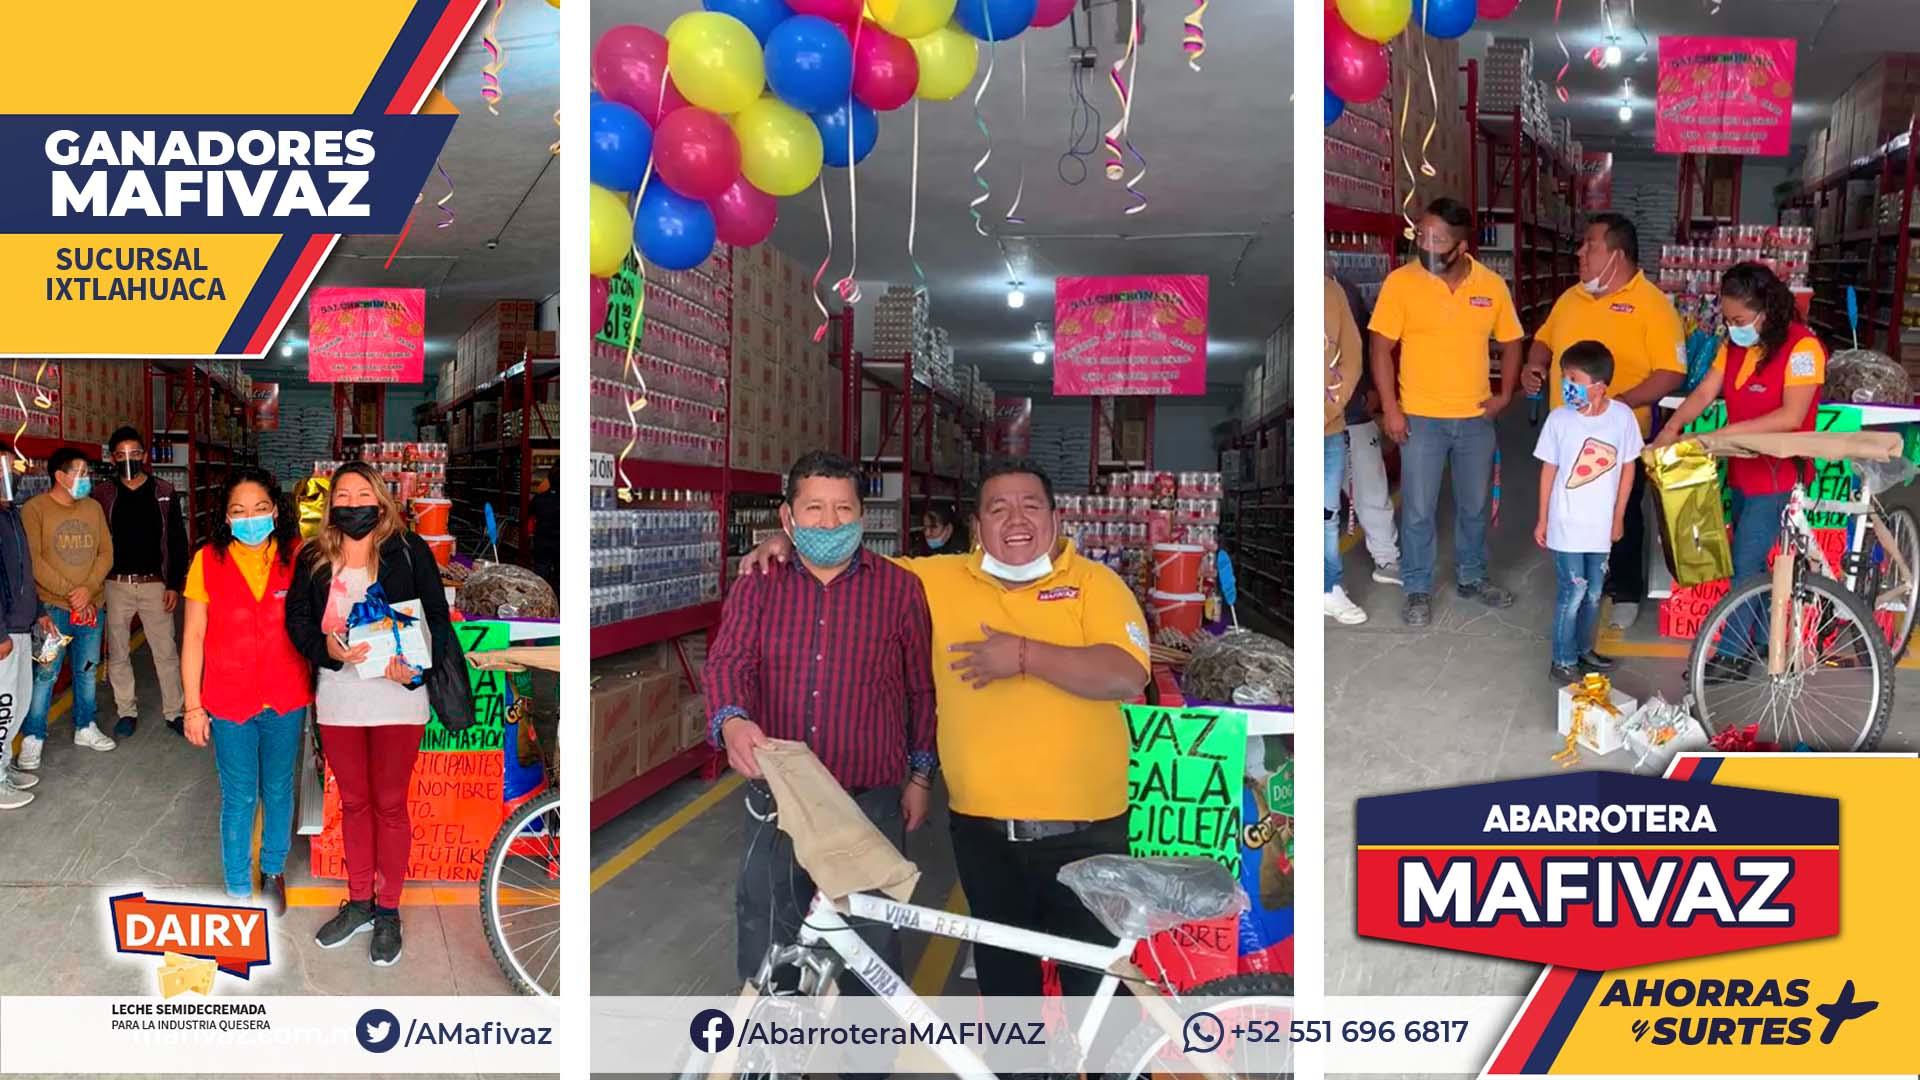 Ganadores MAFIVAZ Ixtlahuaca